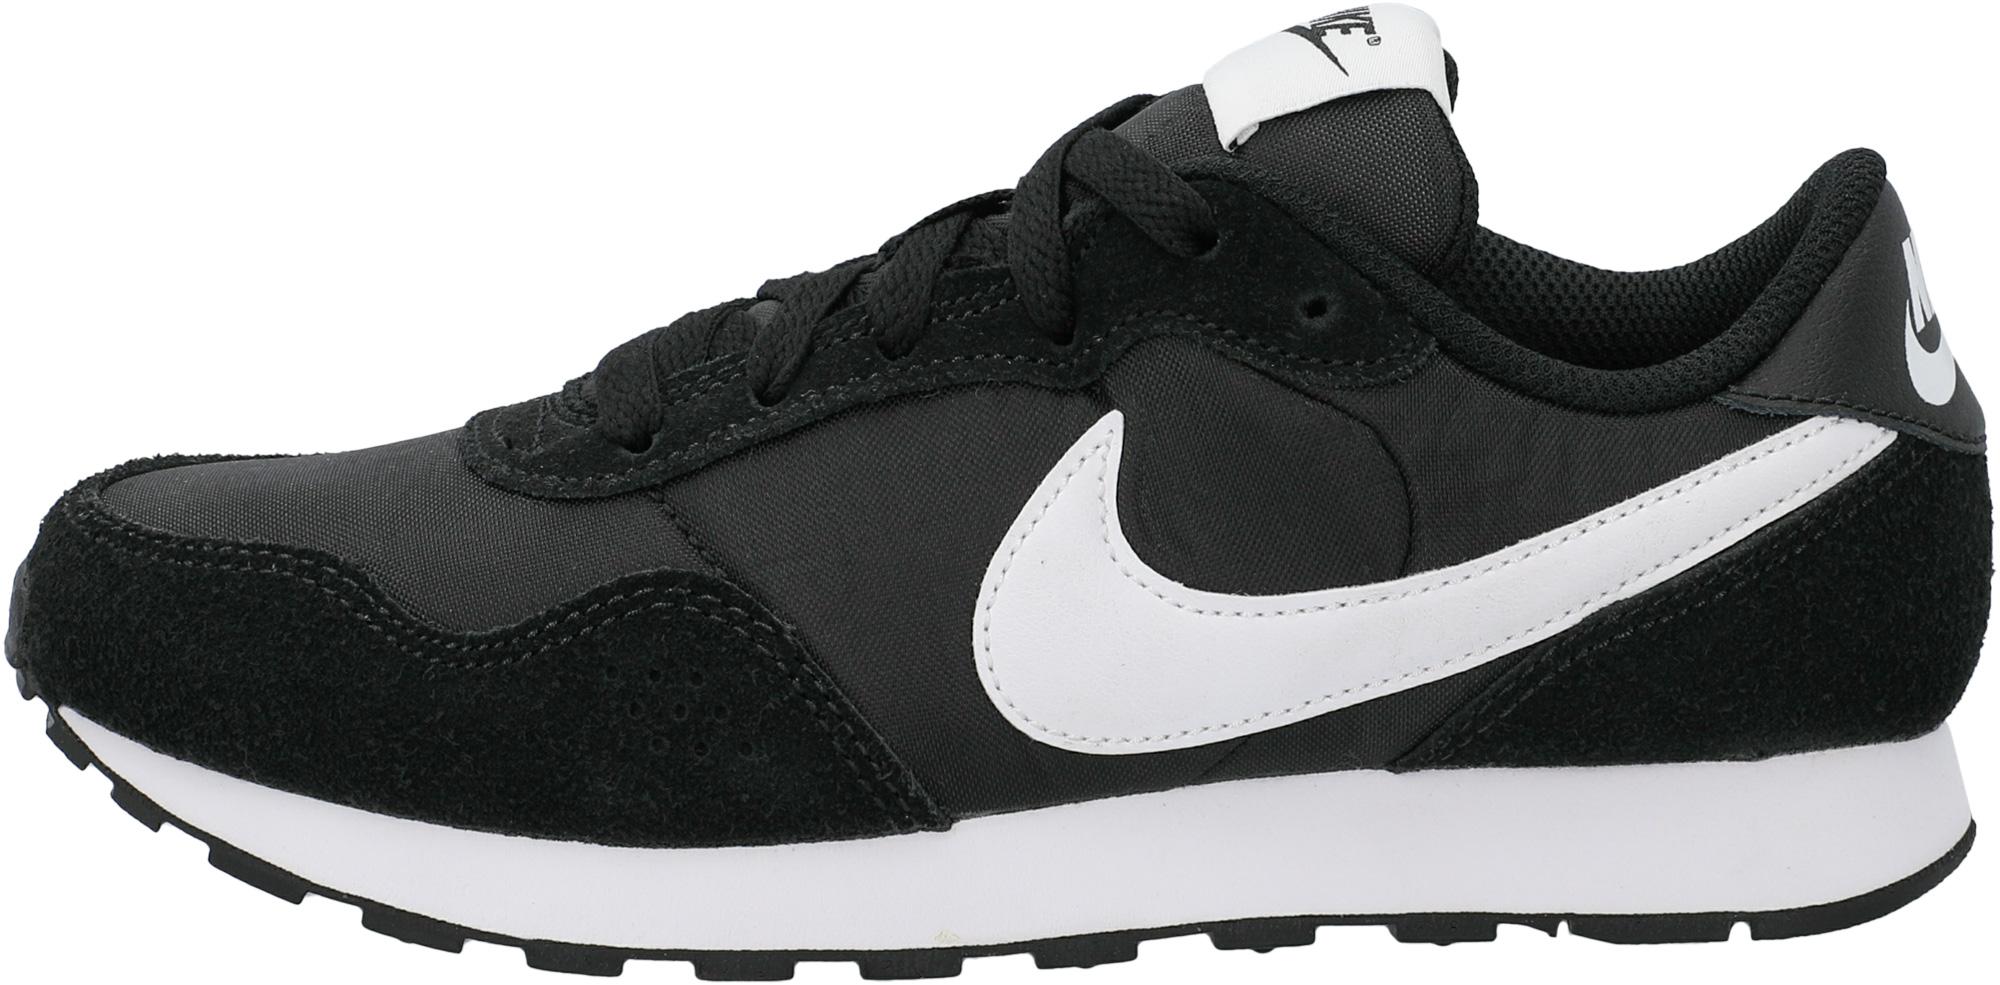 Nike Кроссовки для мальчиков Nike Md Valiant (GS), размер 34.5 кроссовки nike cortez basic ltr se gs shoe girls aa3043 001